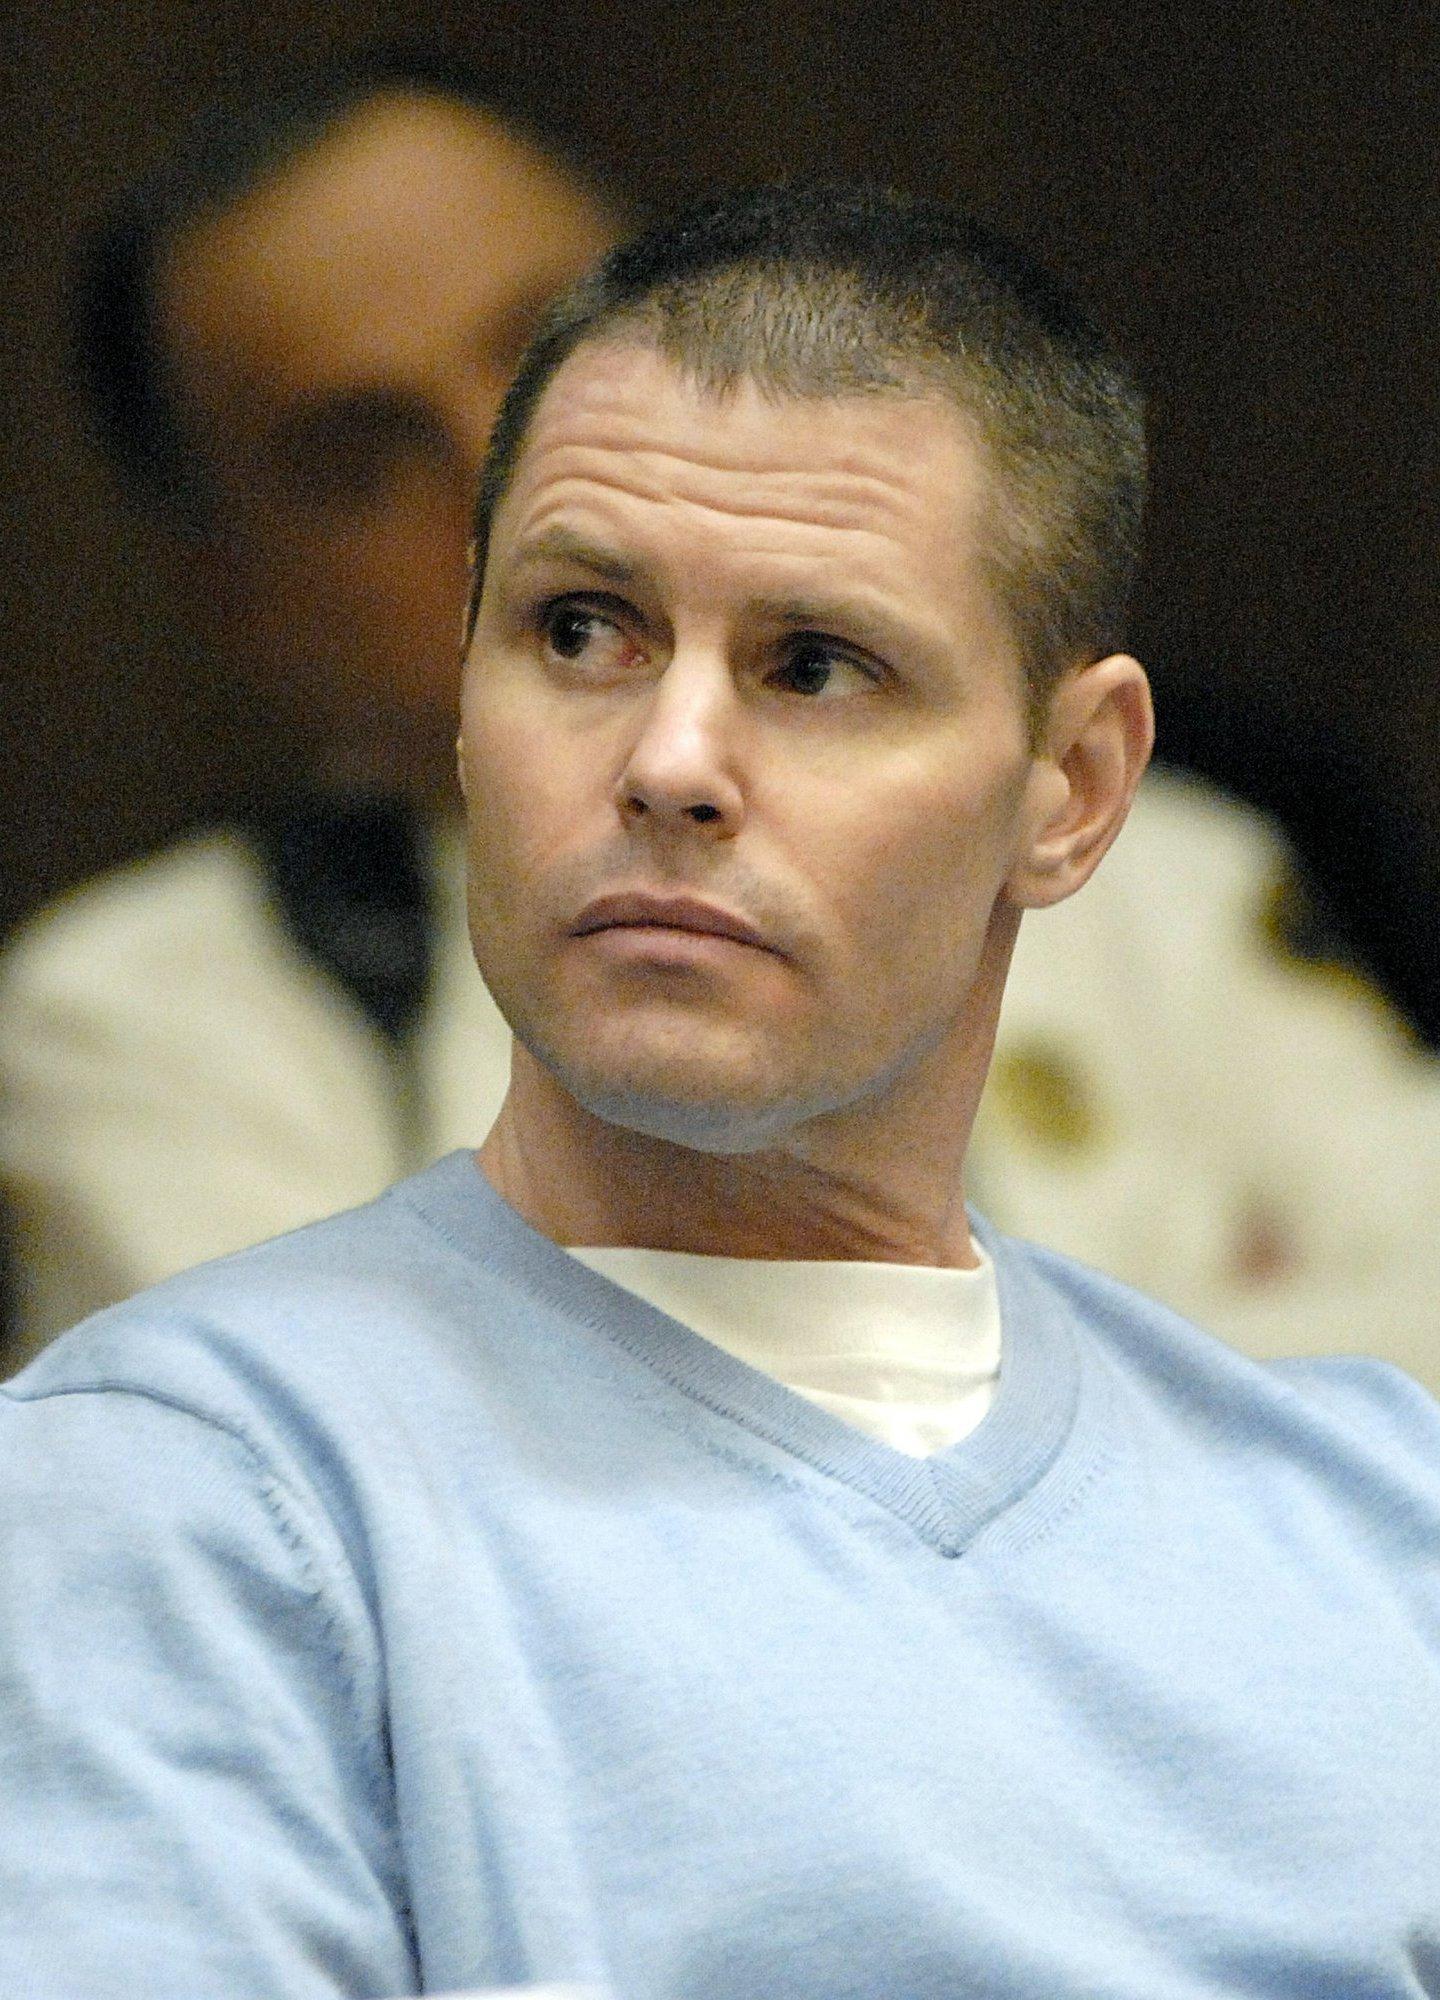 Bulger suspect_1541071215630.jpeg.jpg